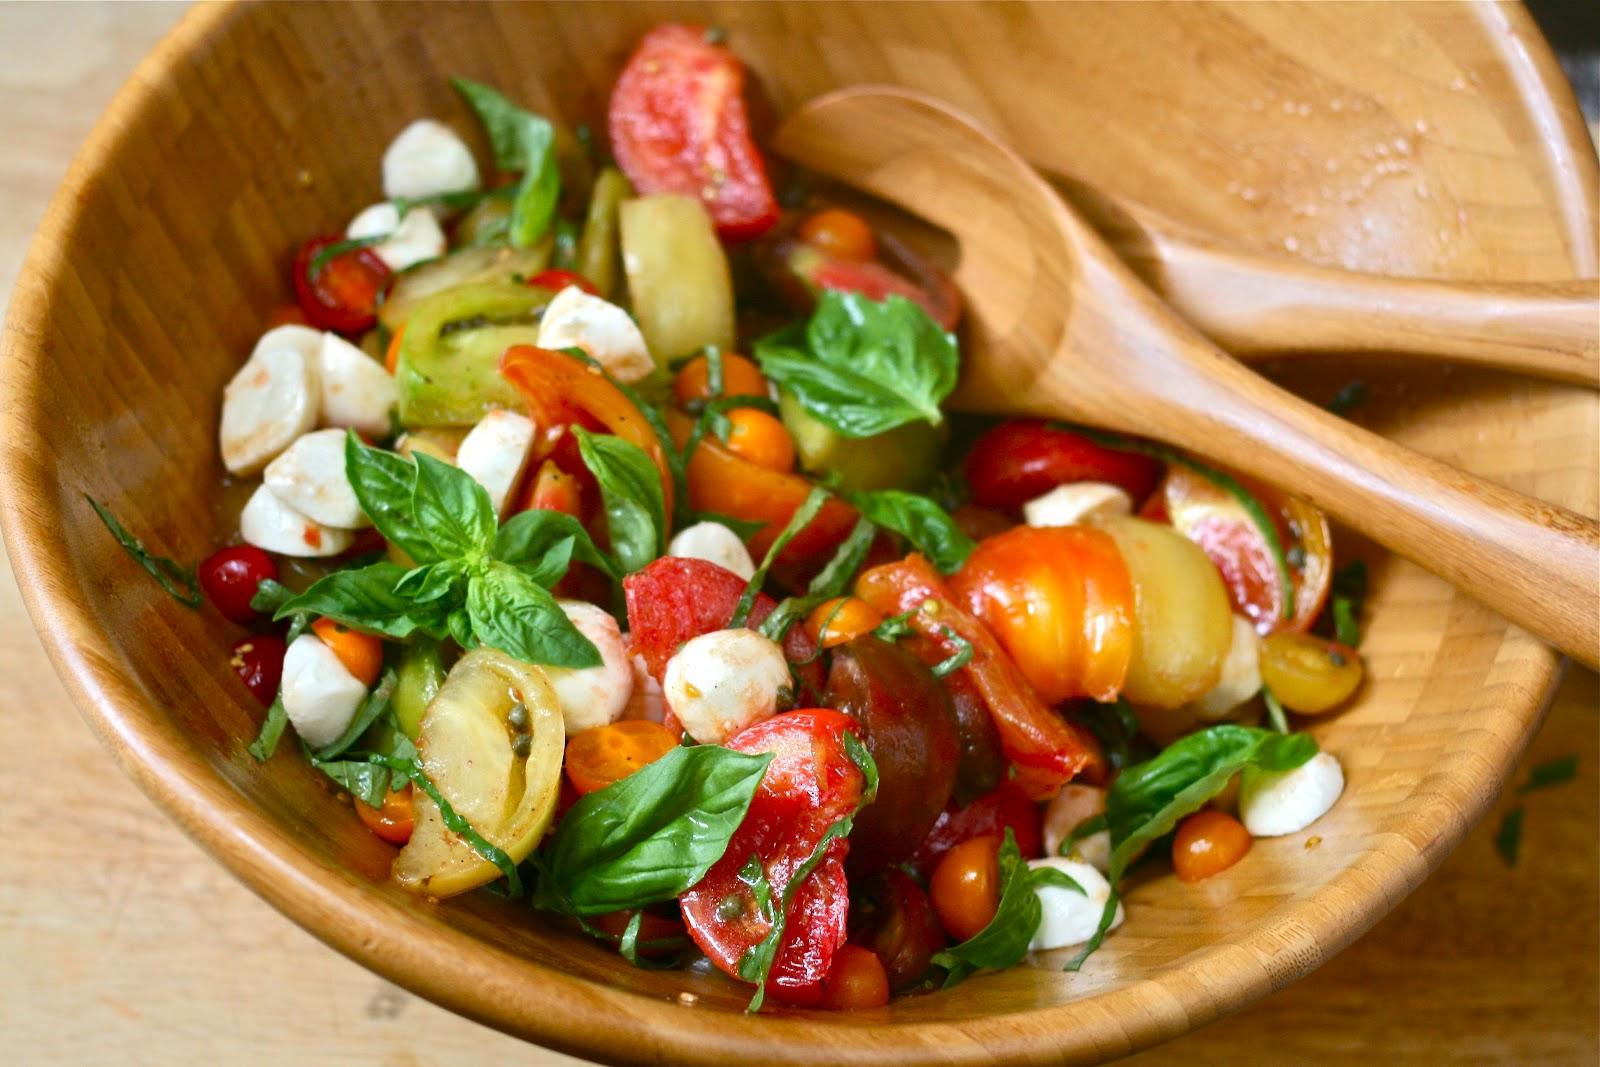 Heirloom Tomato Salad with Basil, Capers & Mozzarella